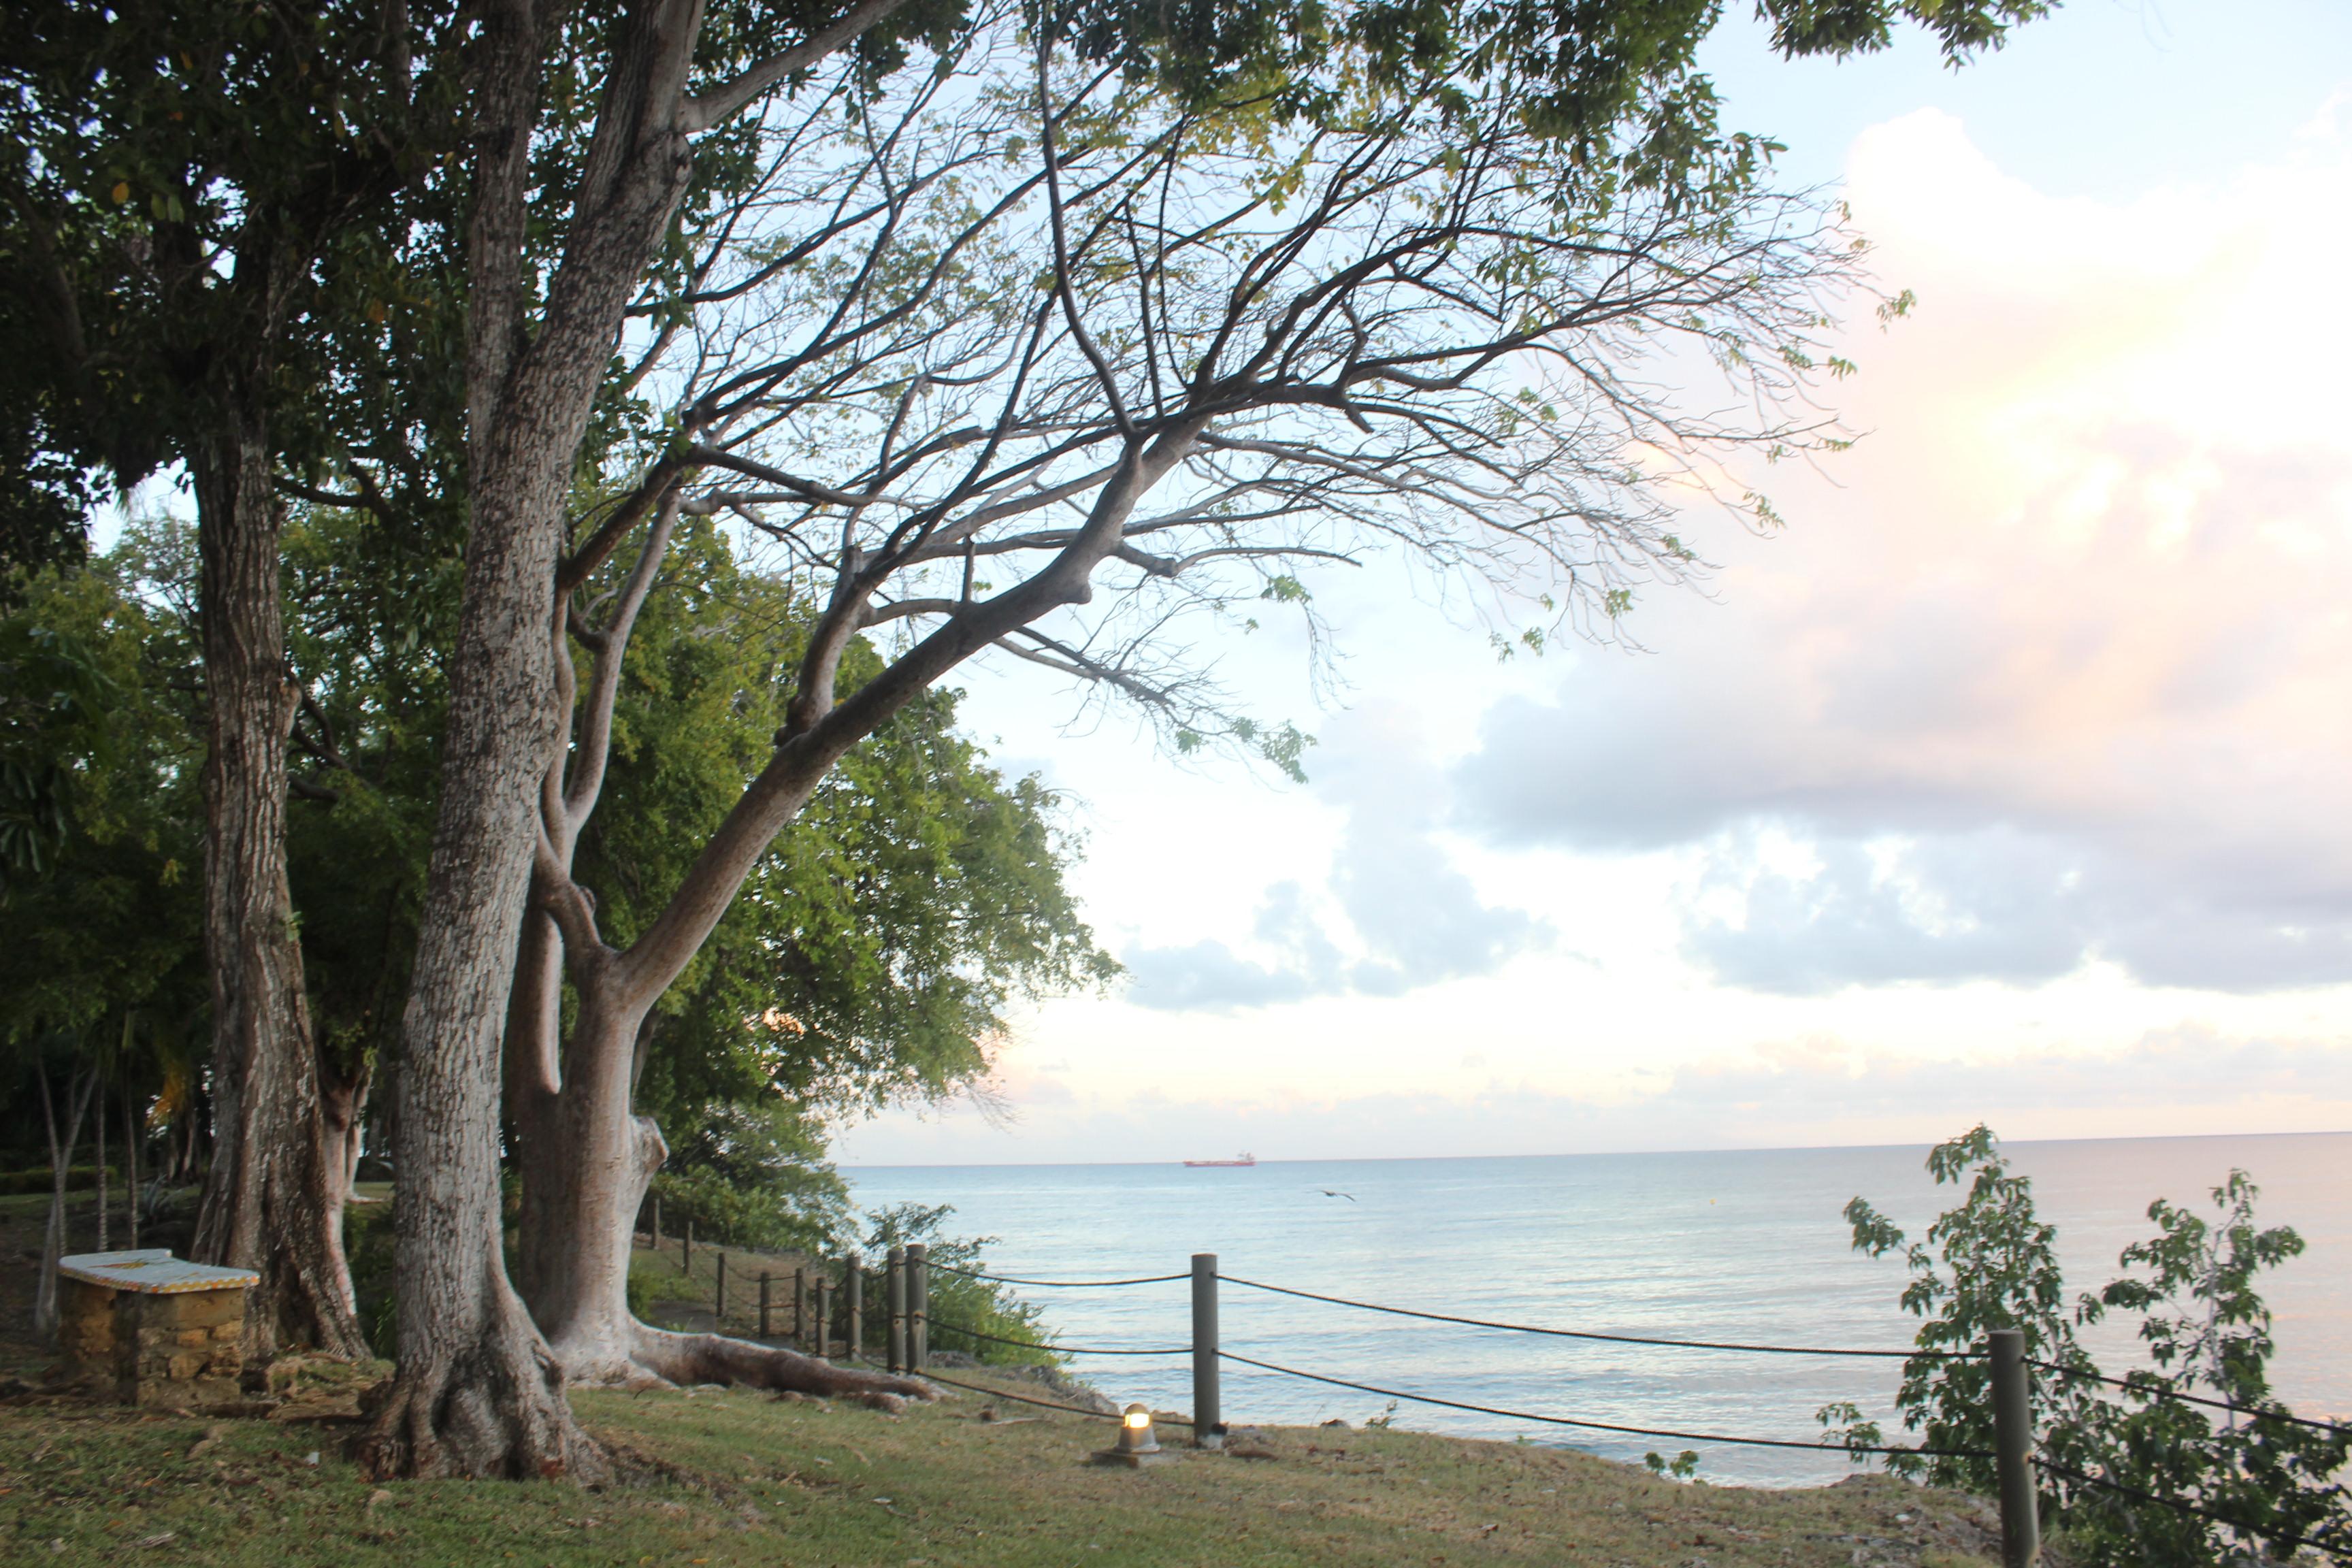 parc creole beach hotel